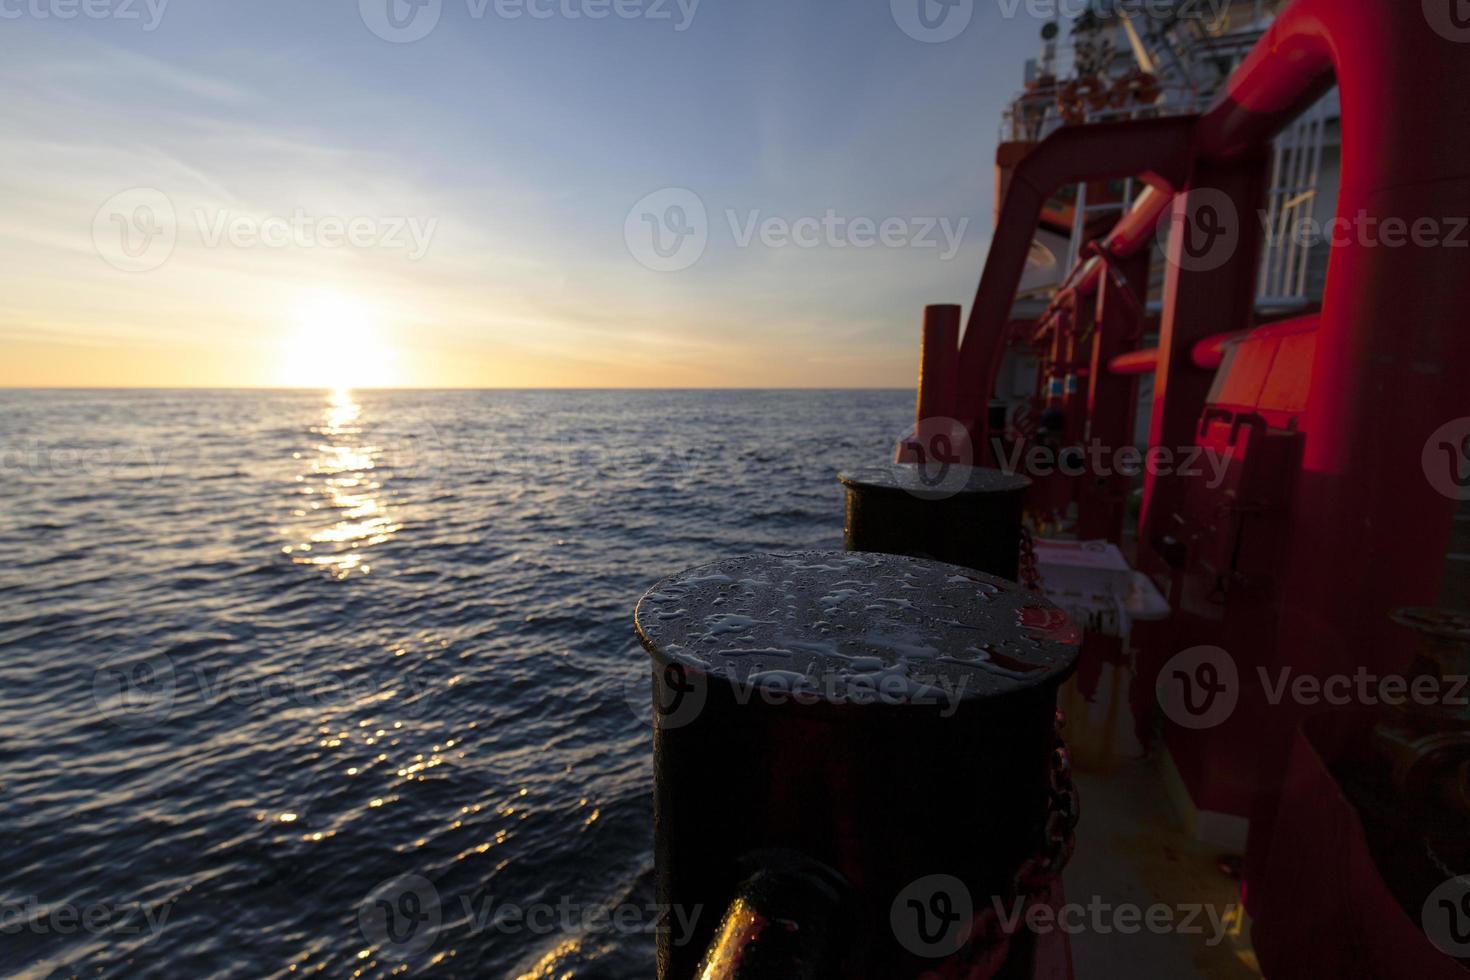 Bollard on the ship, sunset on the background photo